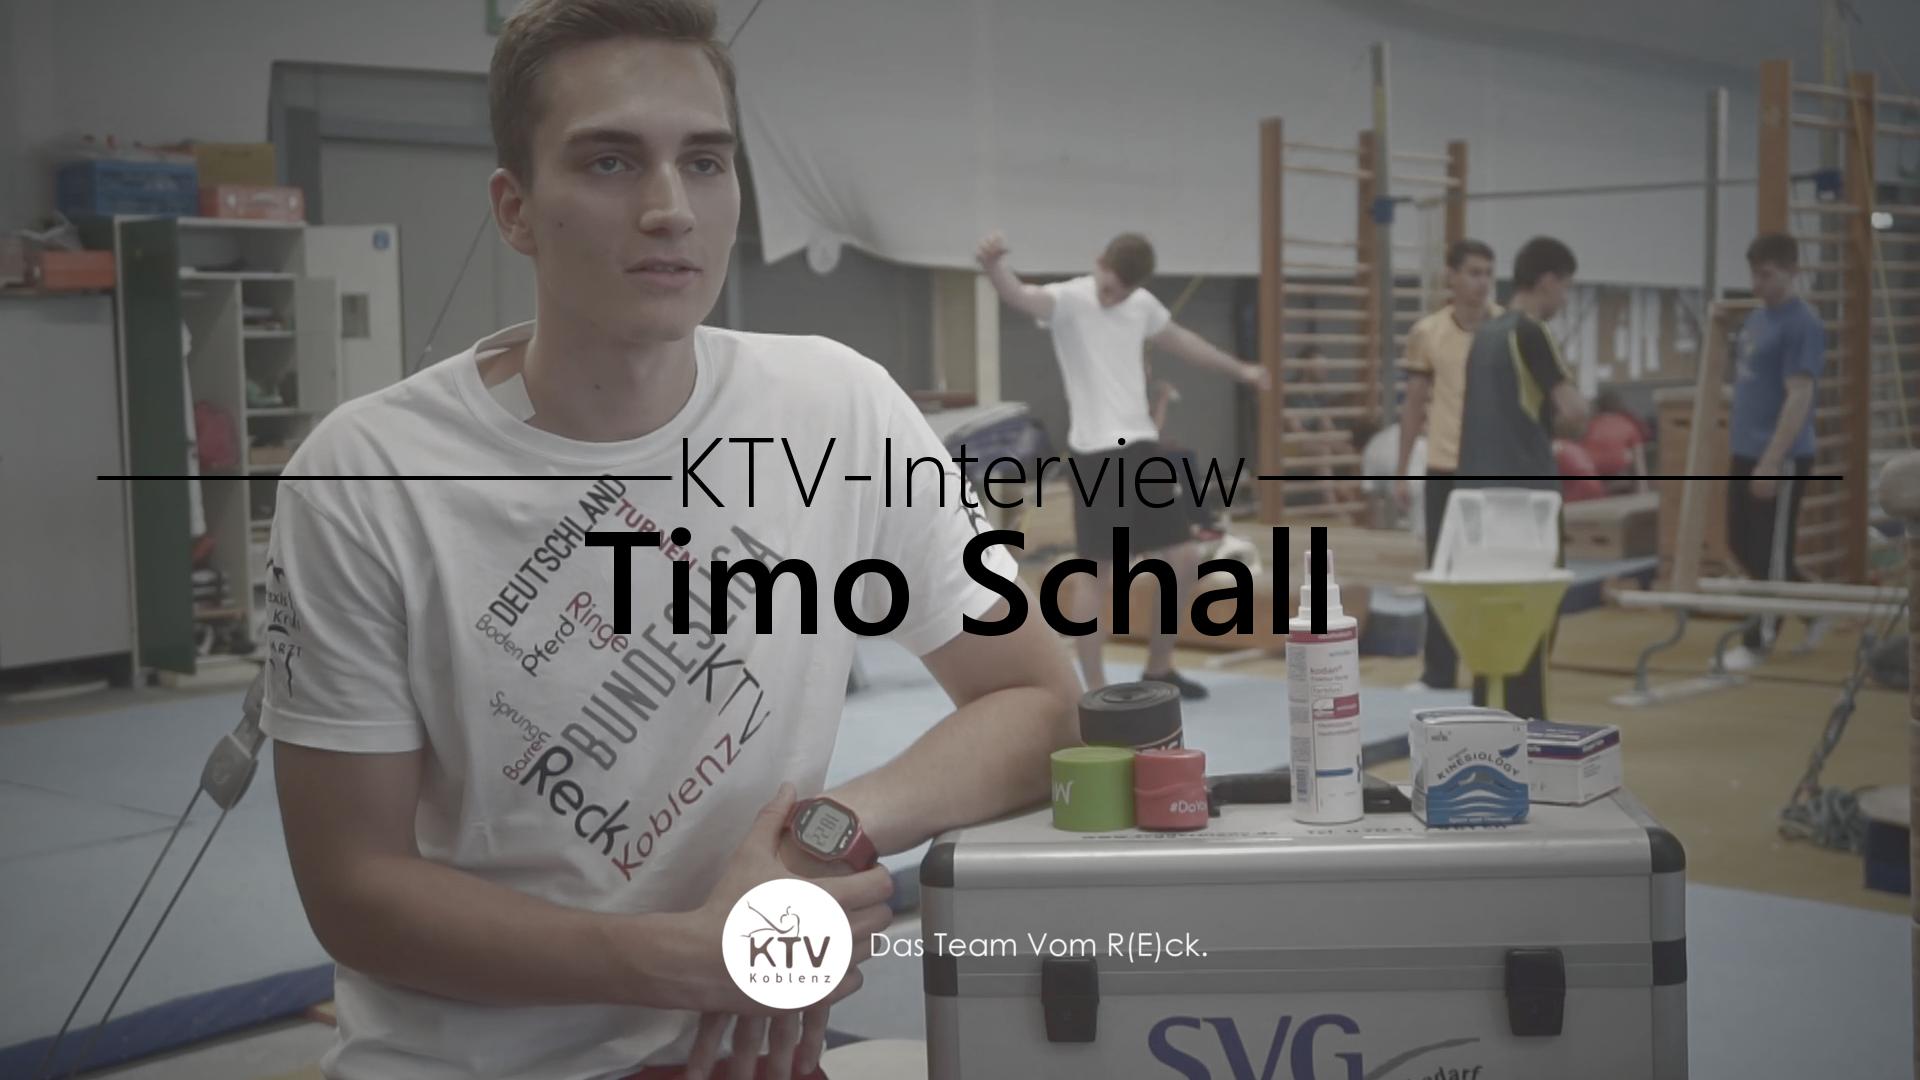 KTV-Interview   Timo Schall